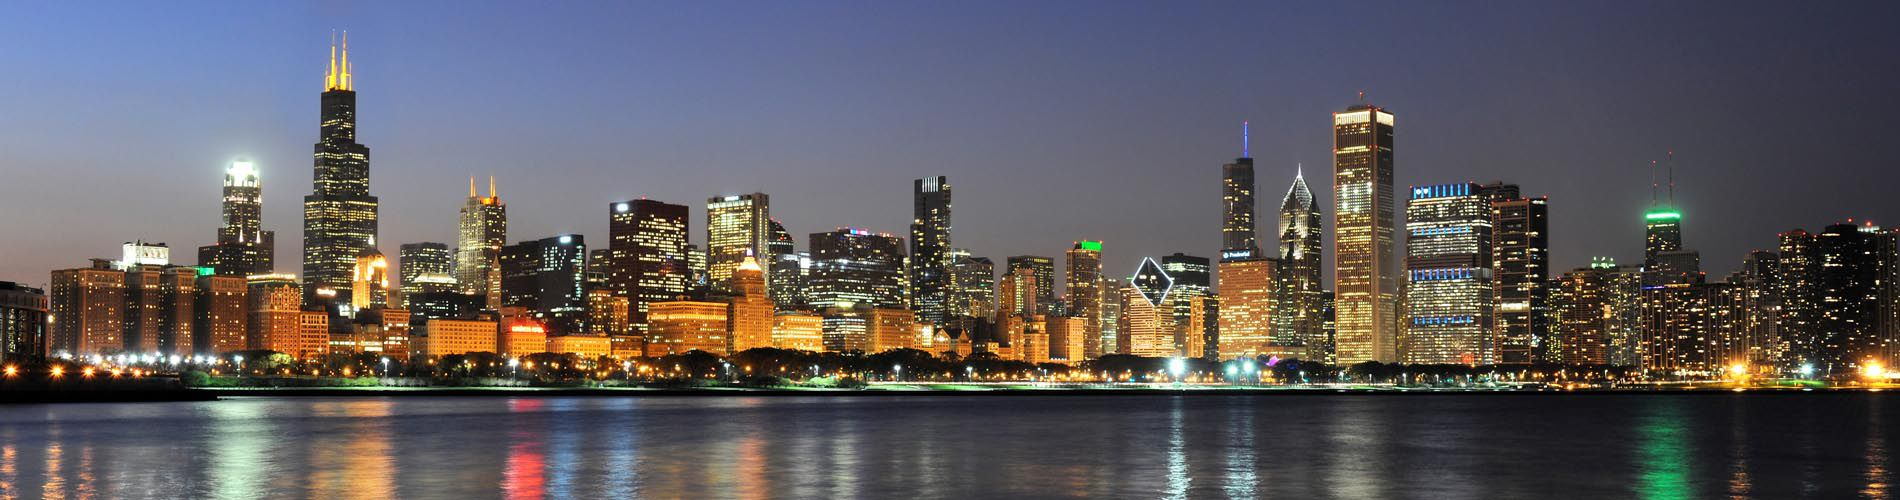 Chicago Metals Service Center - Illinios   McNICHOLS